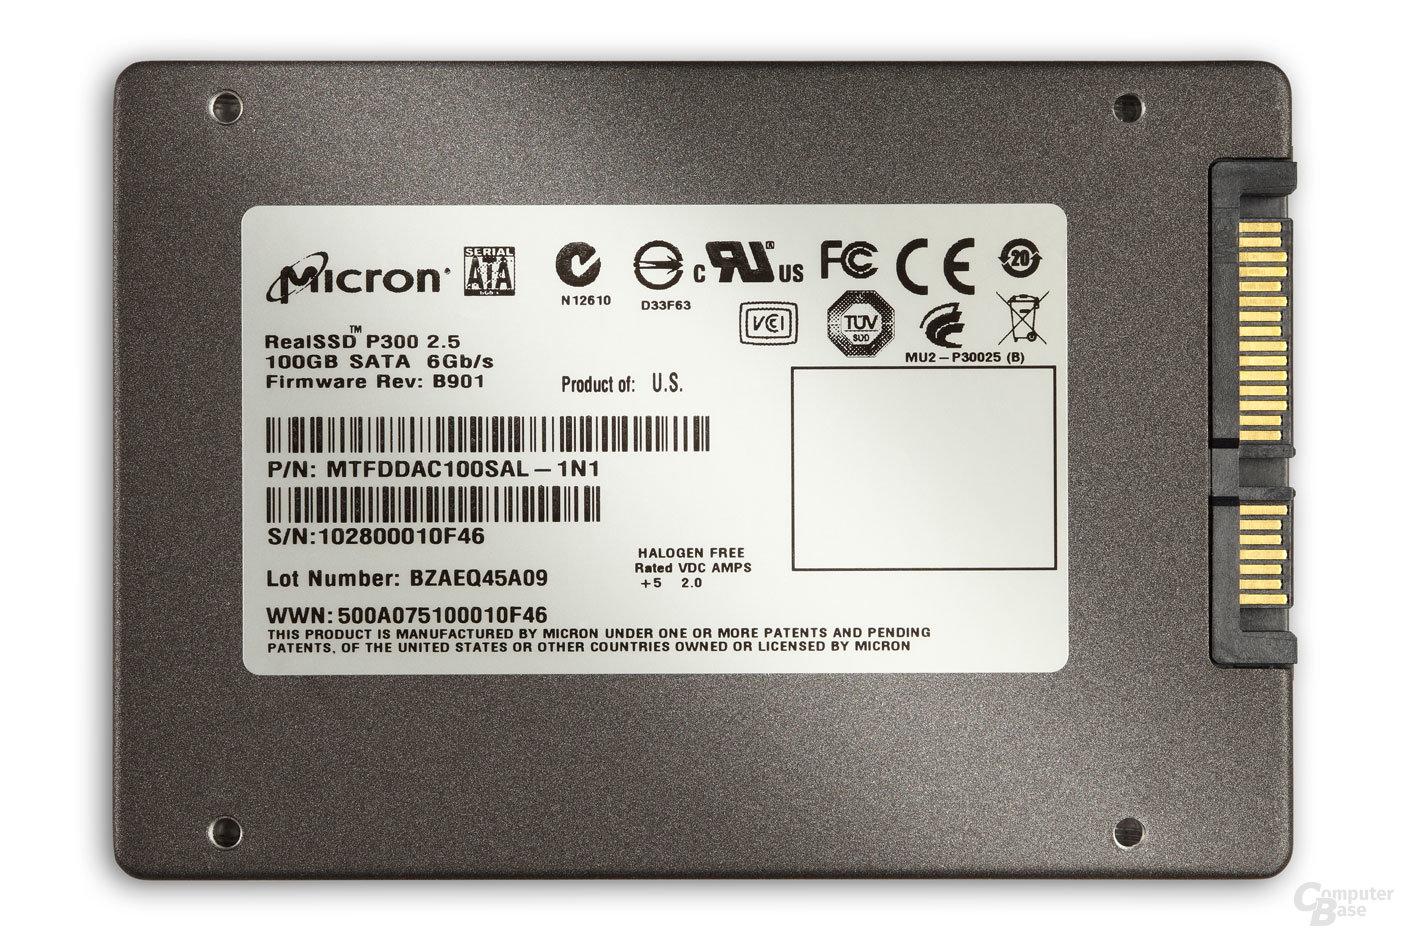 Micron RealSSD P300